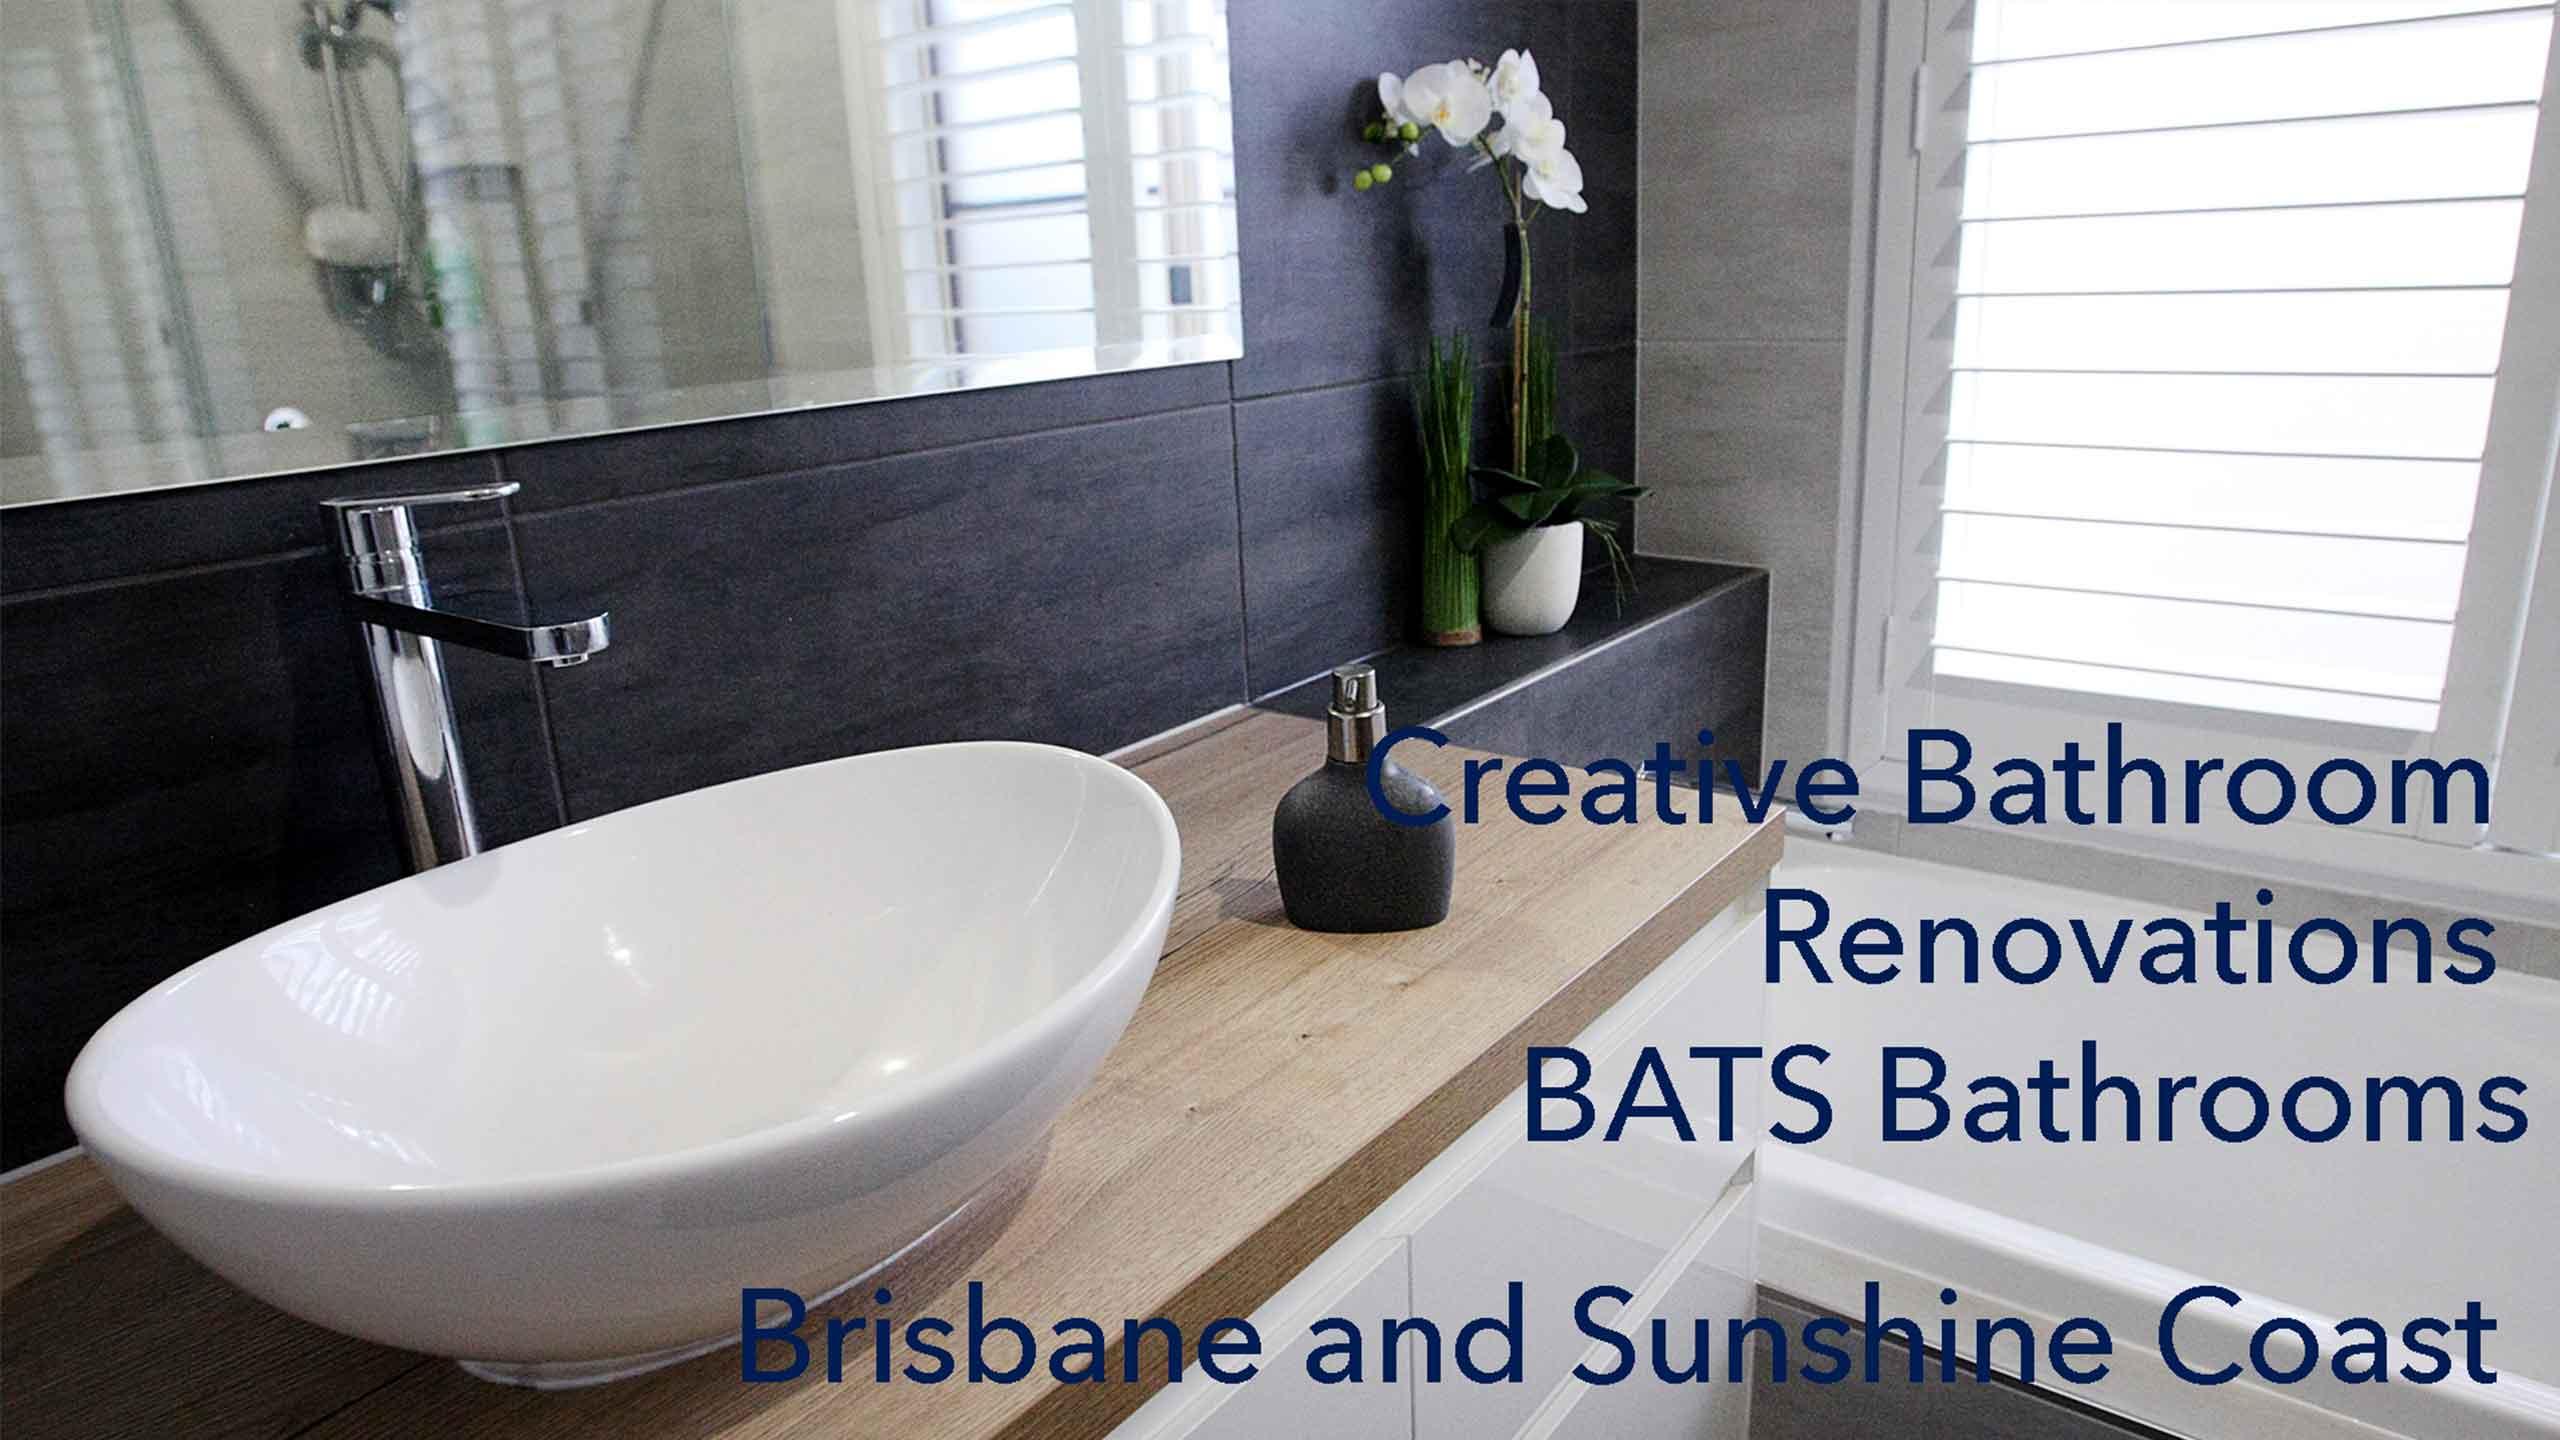 Bathroom Renovation Videos BATS Bathrooms The Brisbane Specialists - Bathroom renovation videos